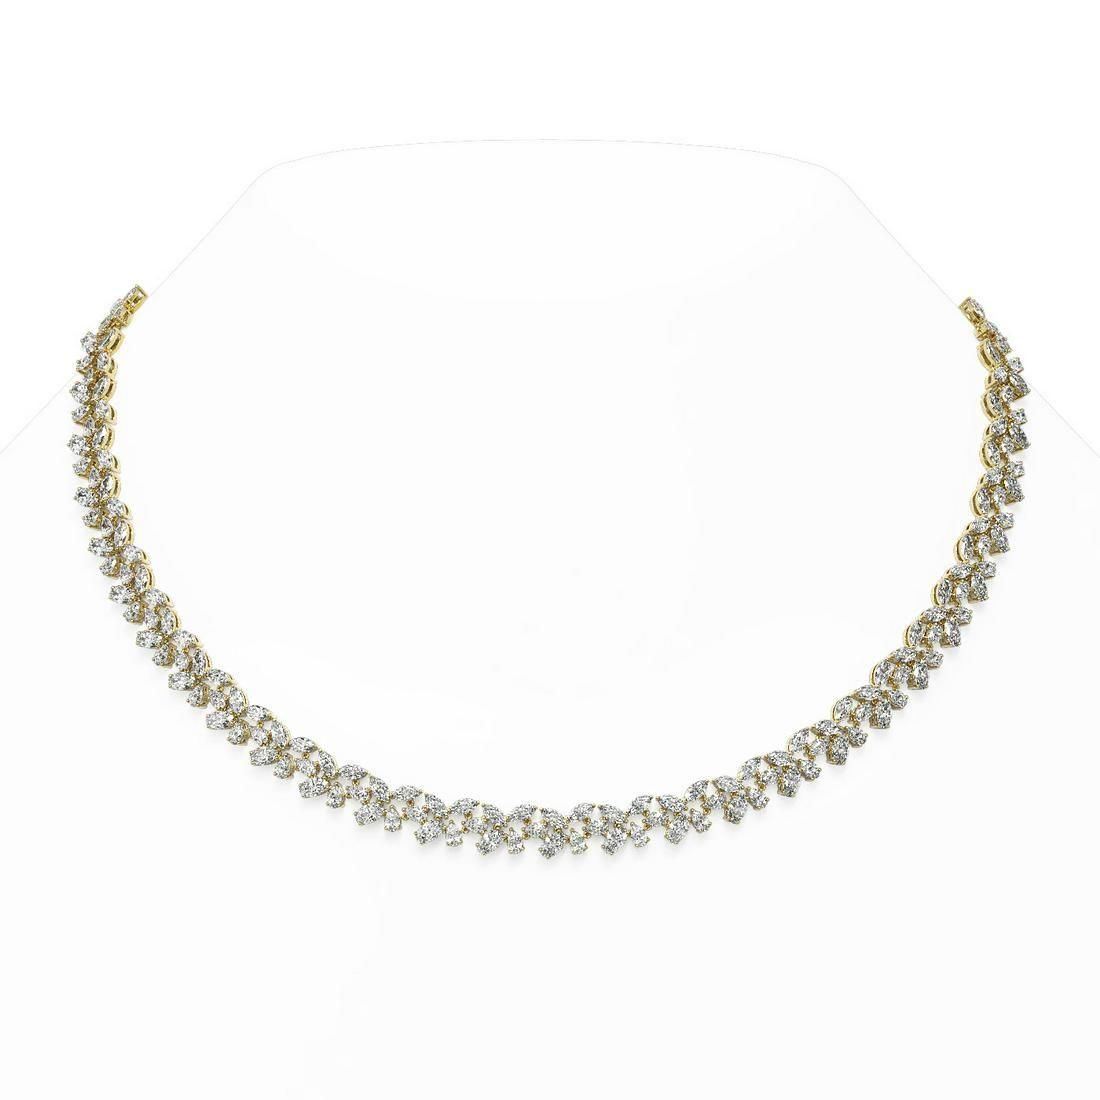 47 ctw Mix Cut Diamonds Designer Necklace 18K Yellow